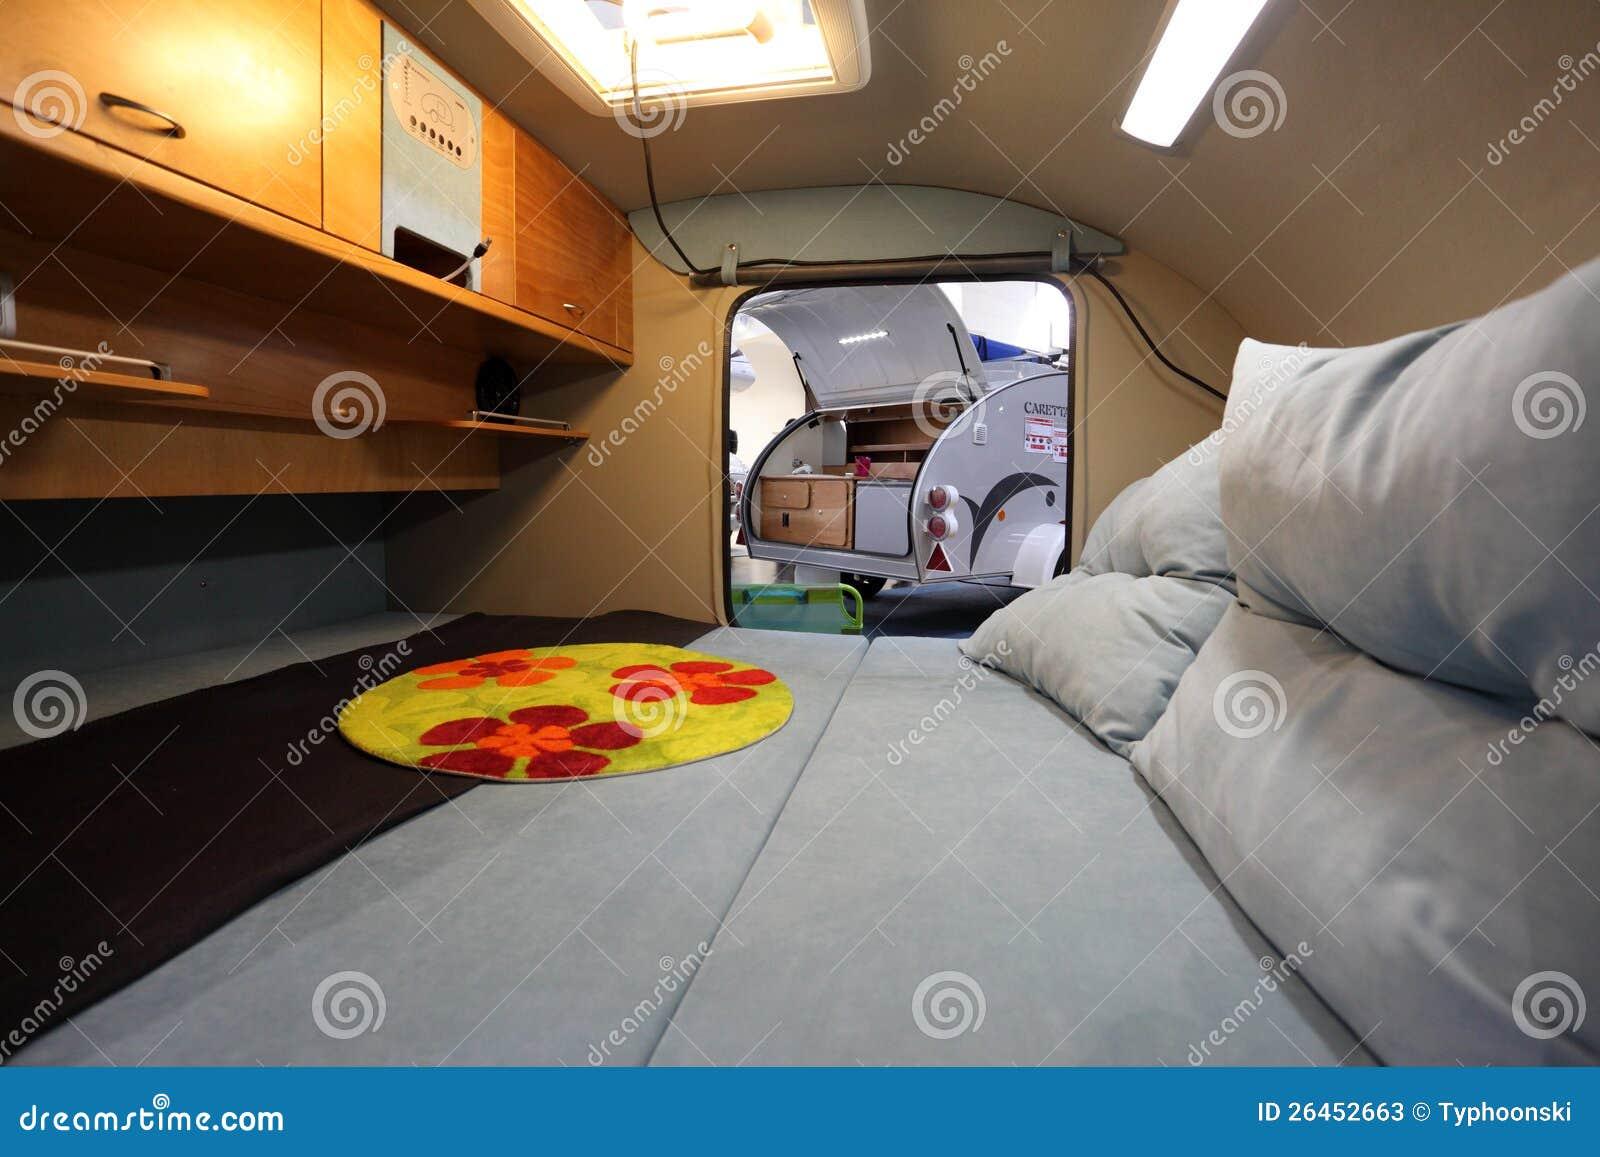 Interior of a small caravan editorial stock photo image for Small caravan interior designs